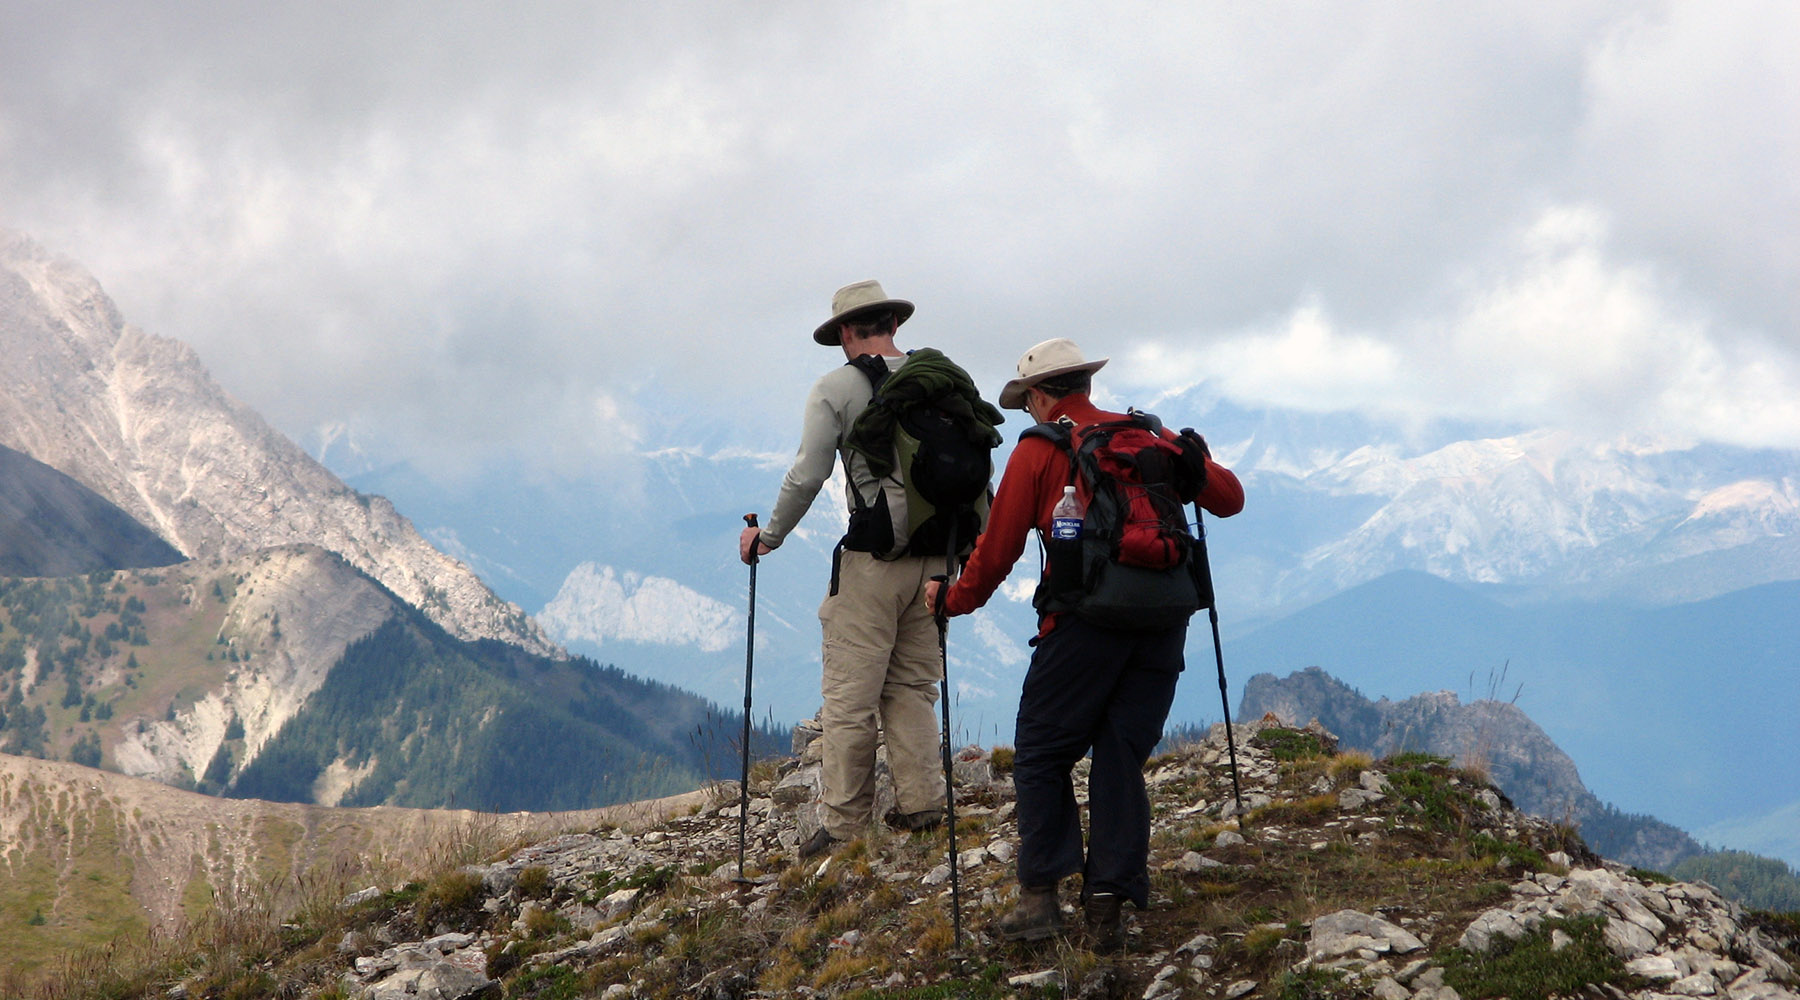 Rocheuses canadiennes, Chinook voyages, aventure, randonnée, ouest canadien